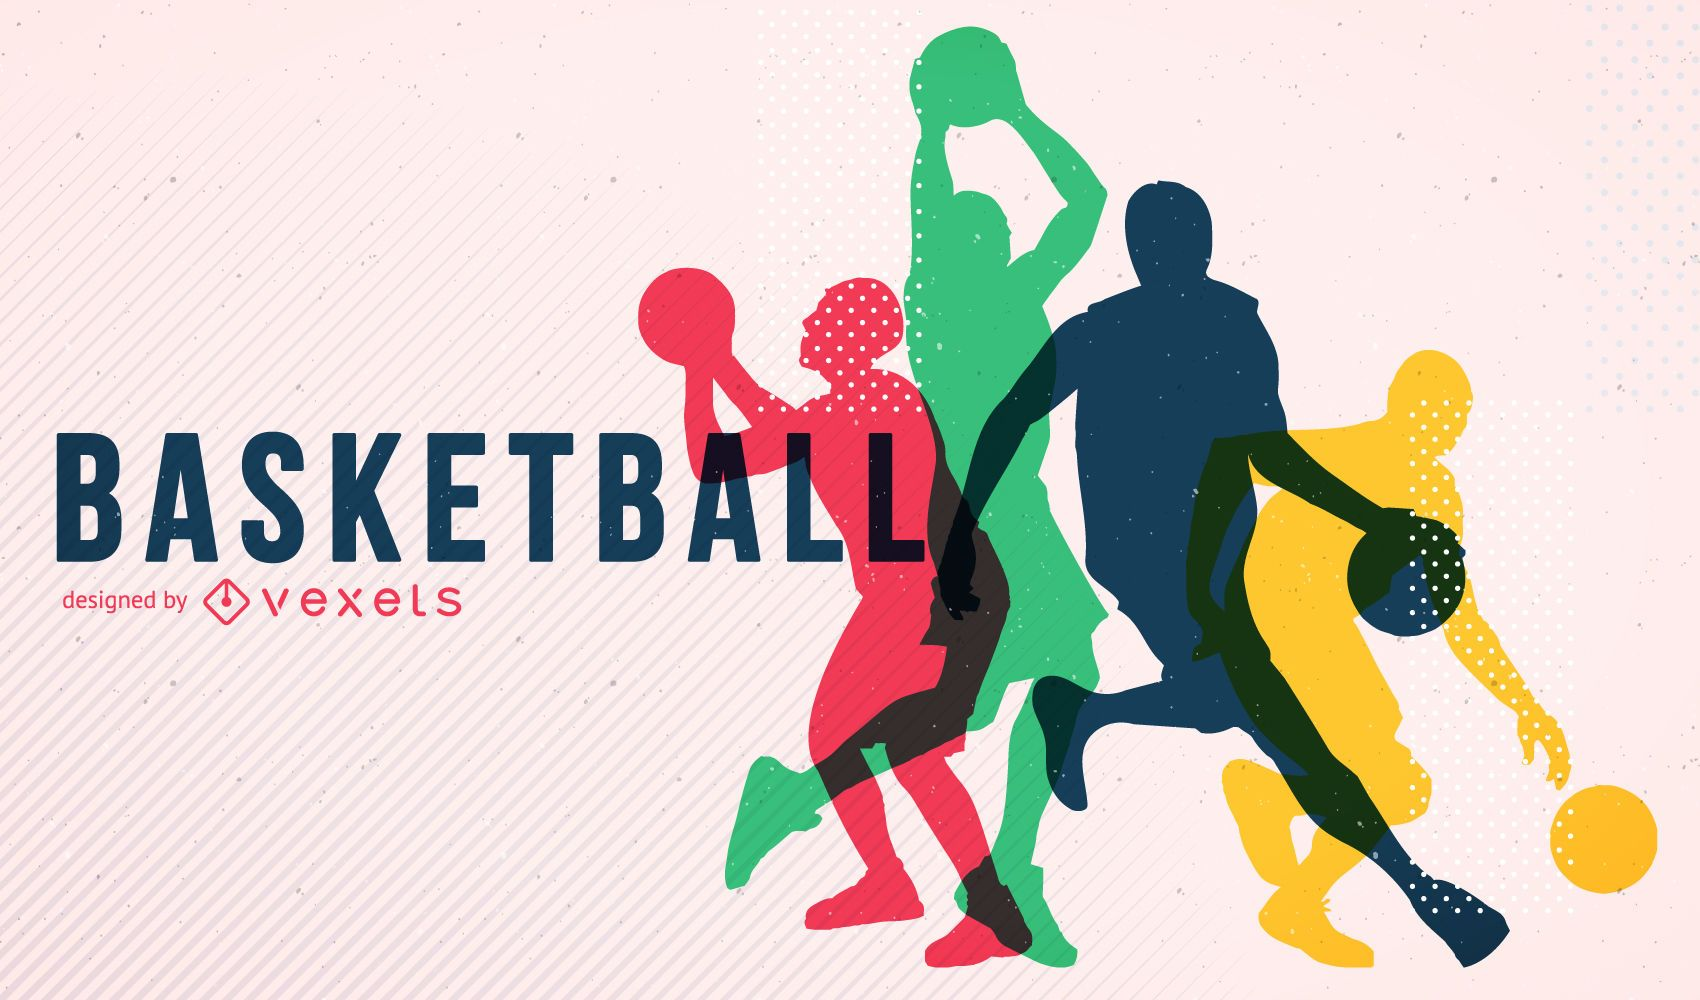 Póster silueta de baloncesto